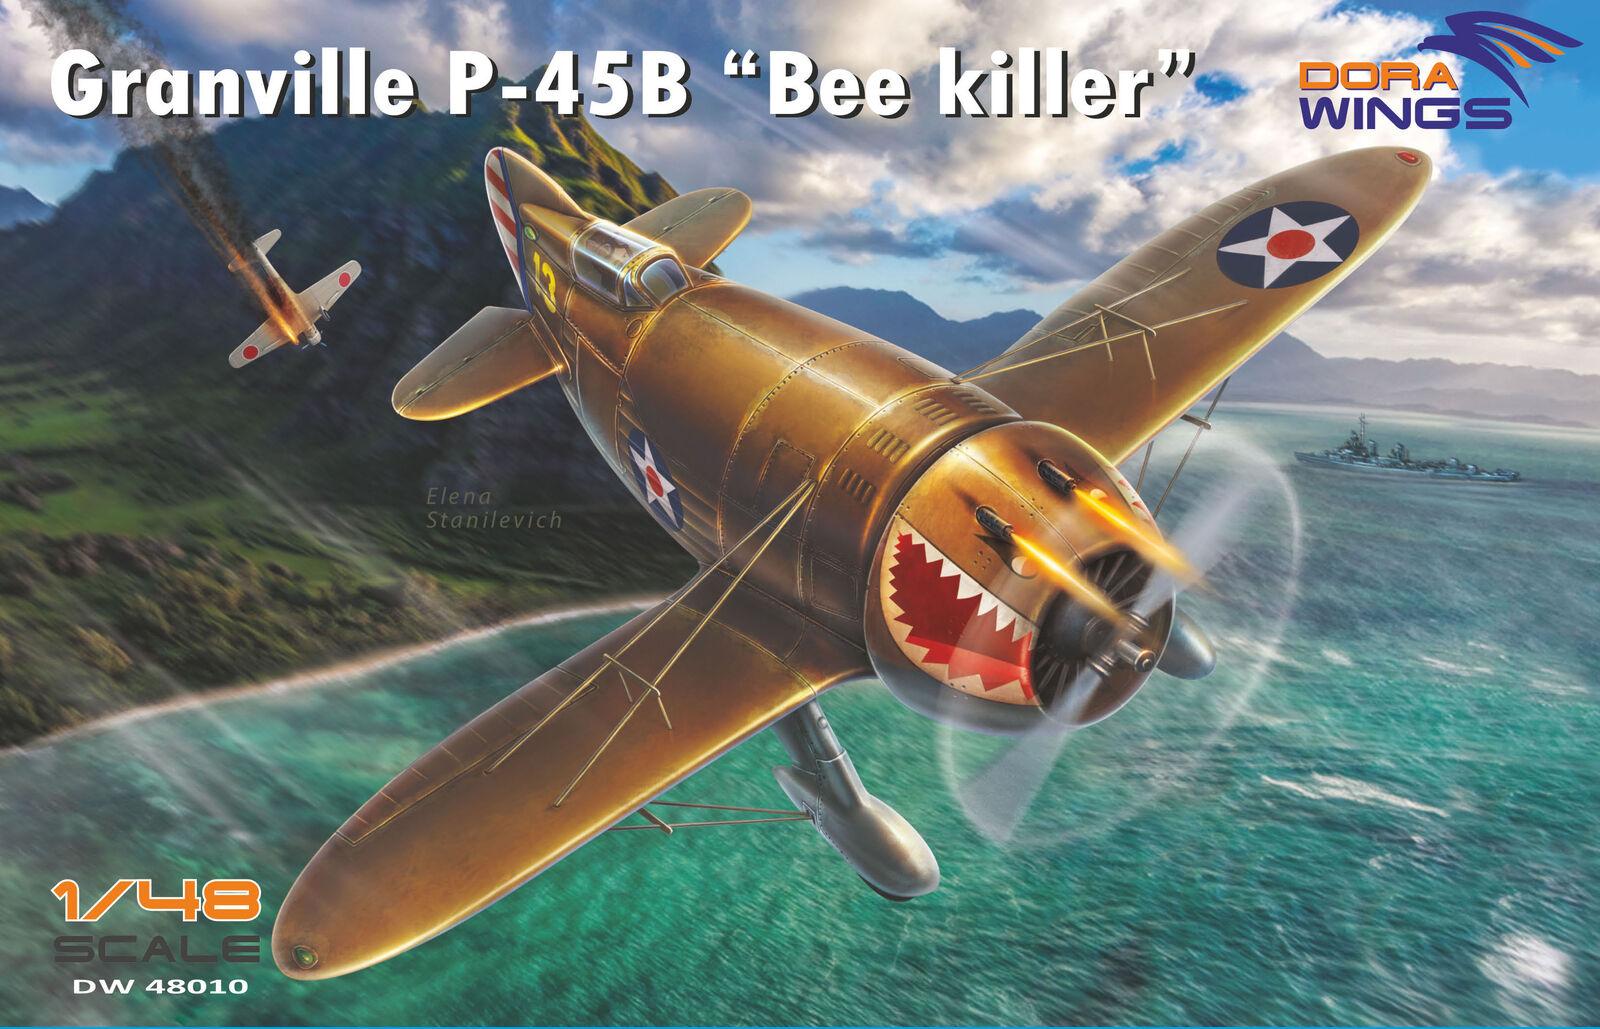 Dora Wings 1 48 Granville P-45B  Bee Killer